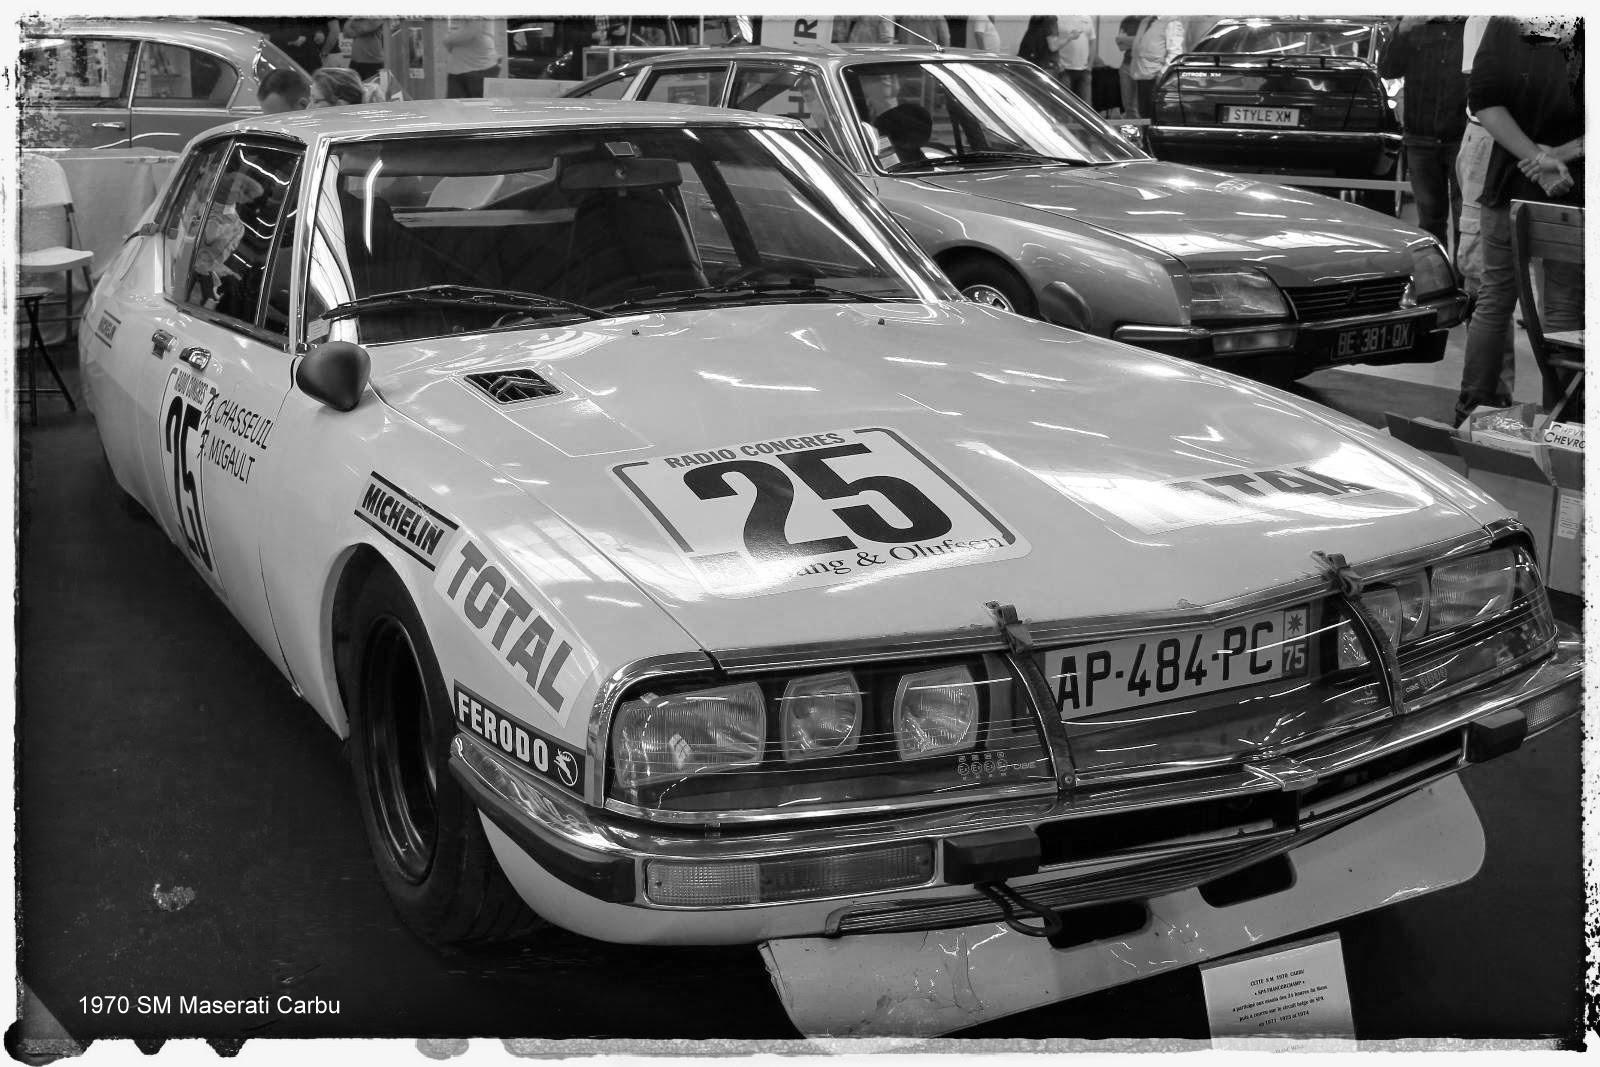 Automédon - 1970 SM Maserati Carbu